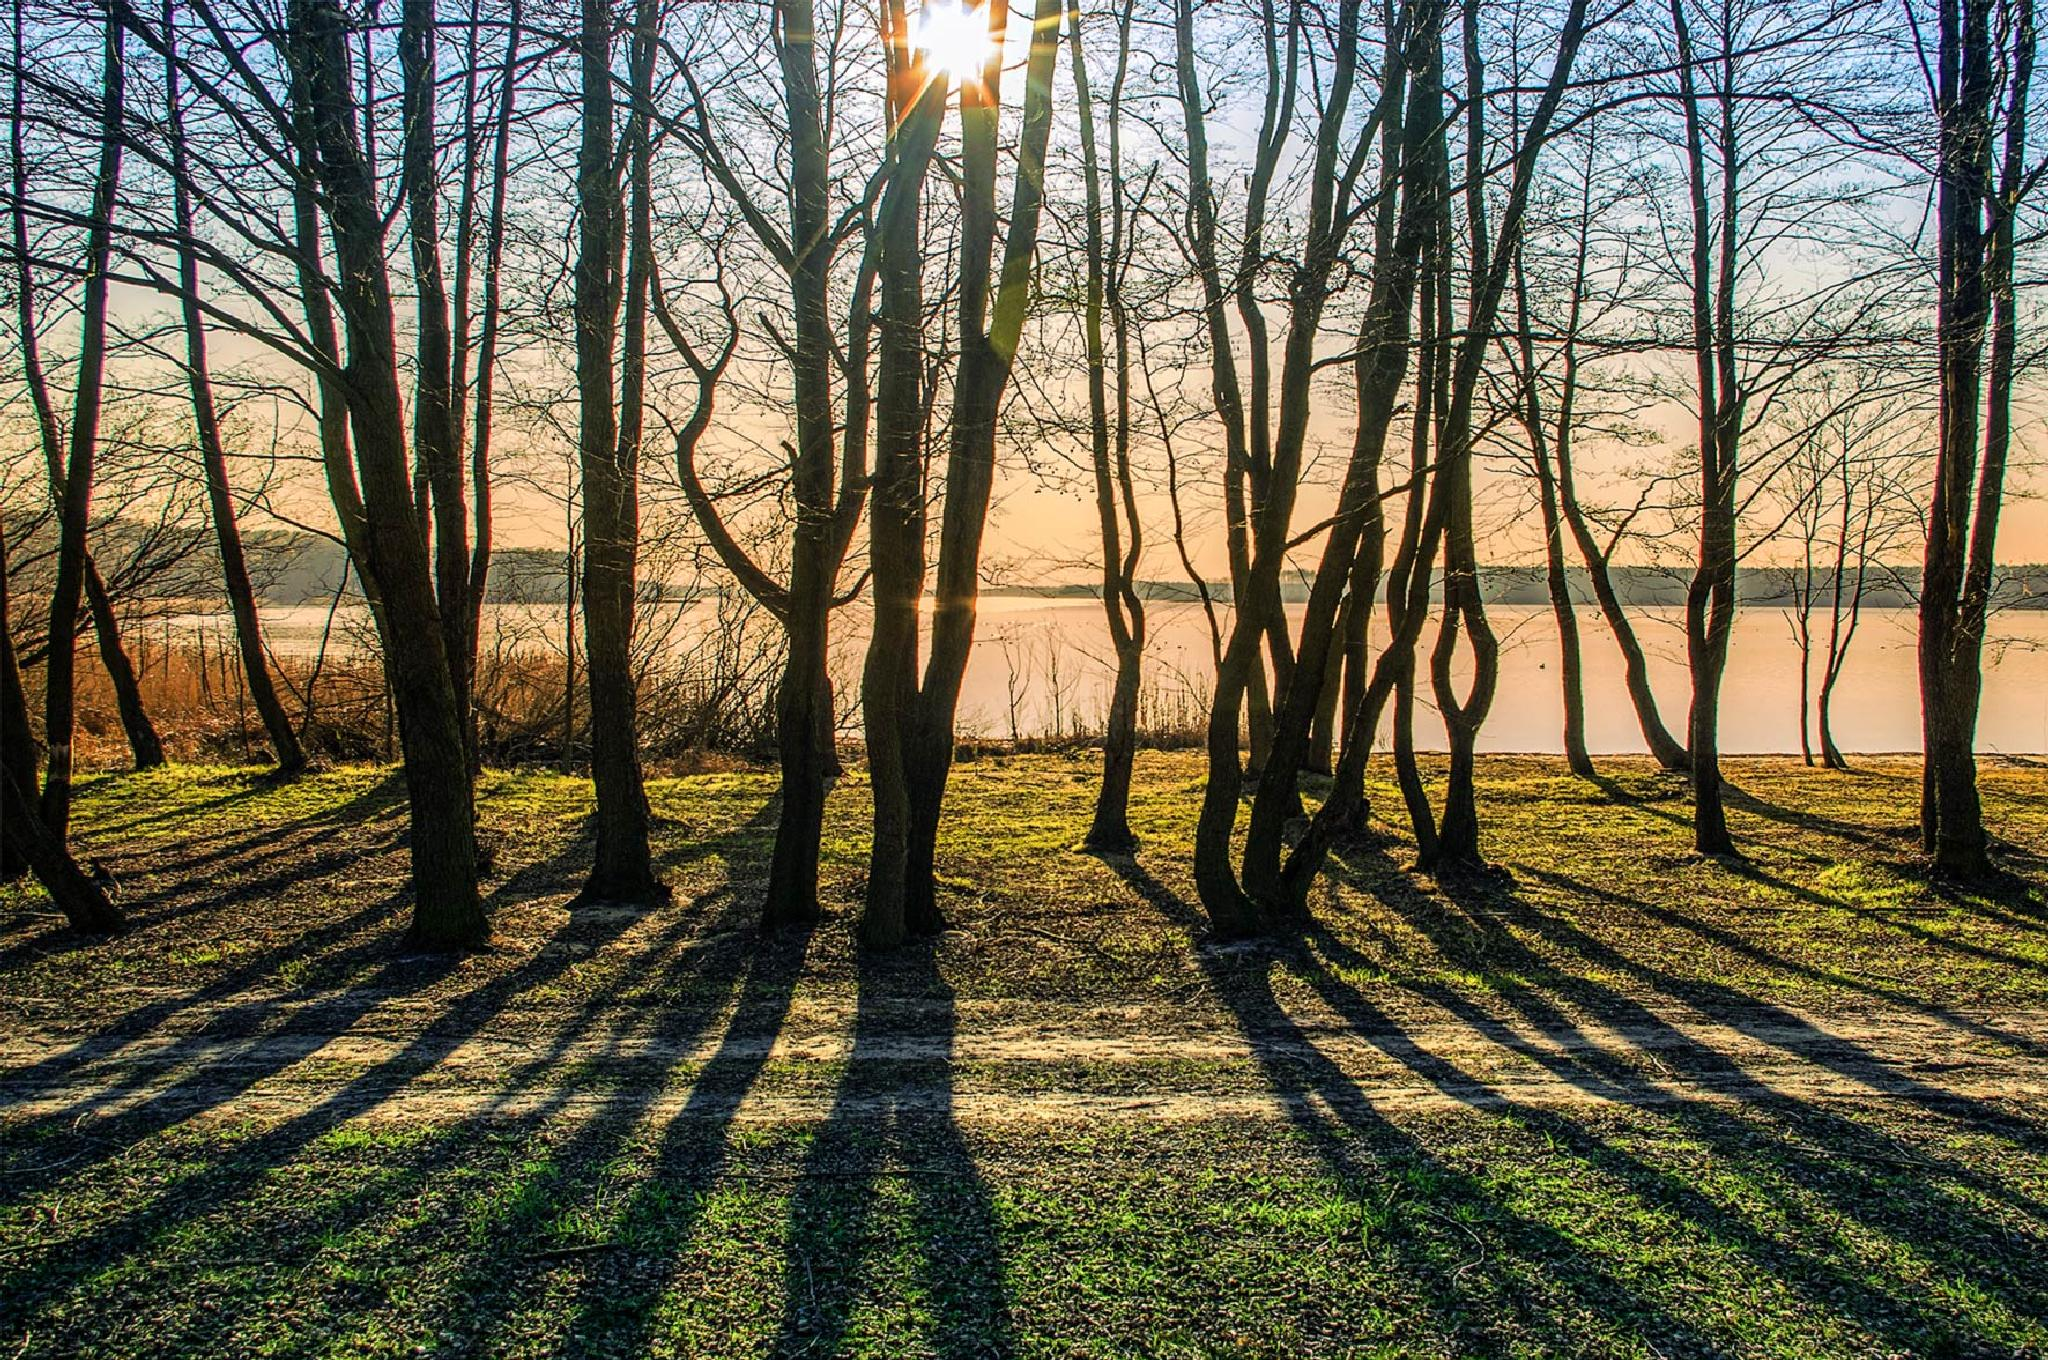 light and shadows by Tomasz Marciniak